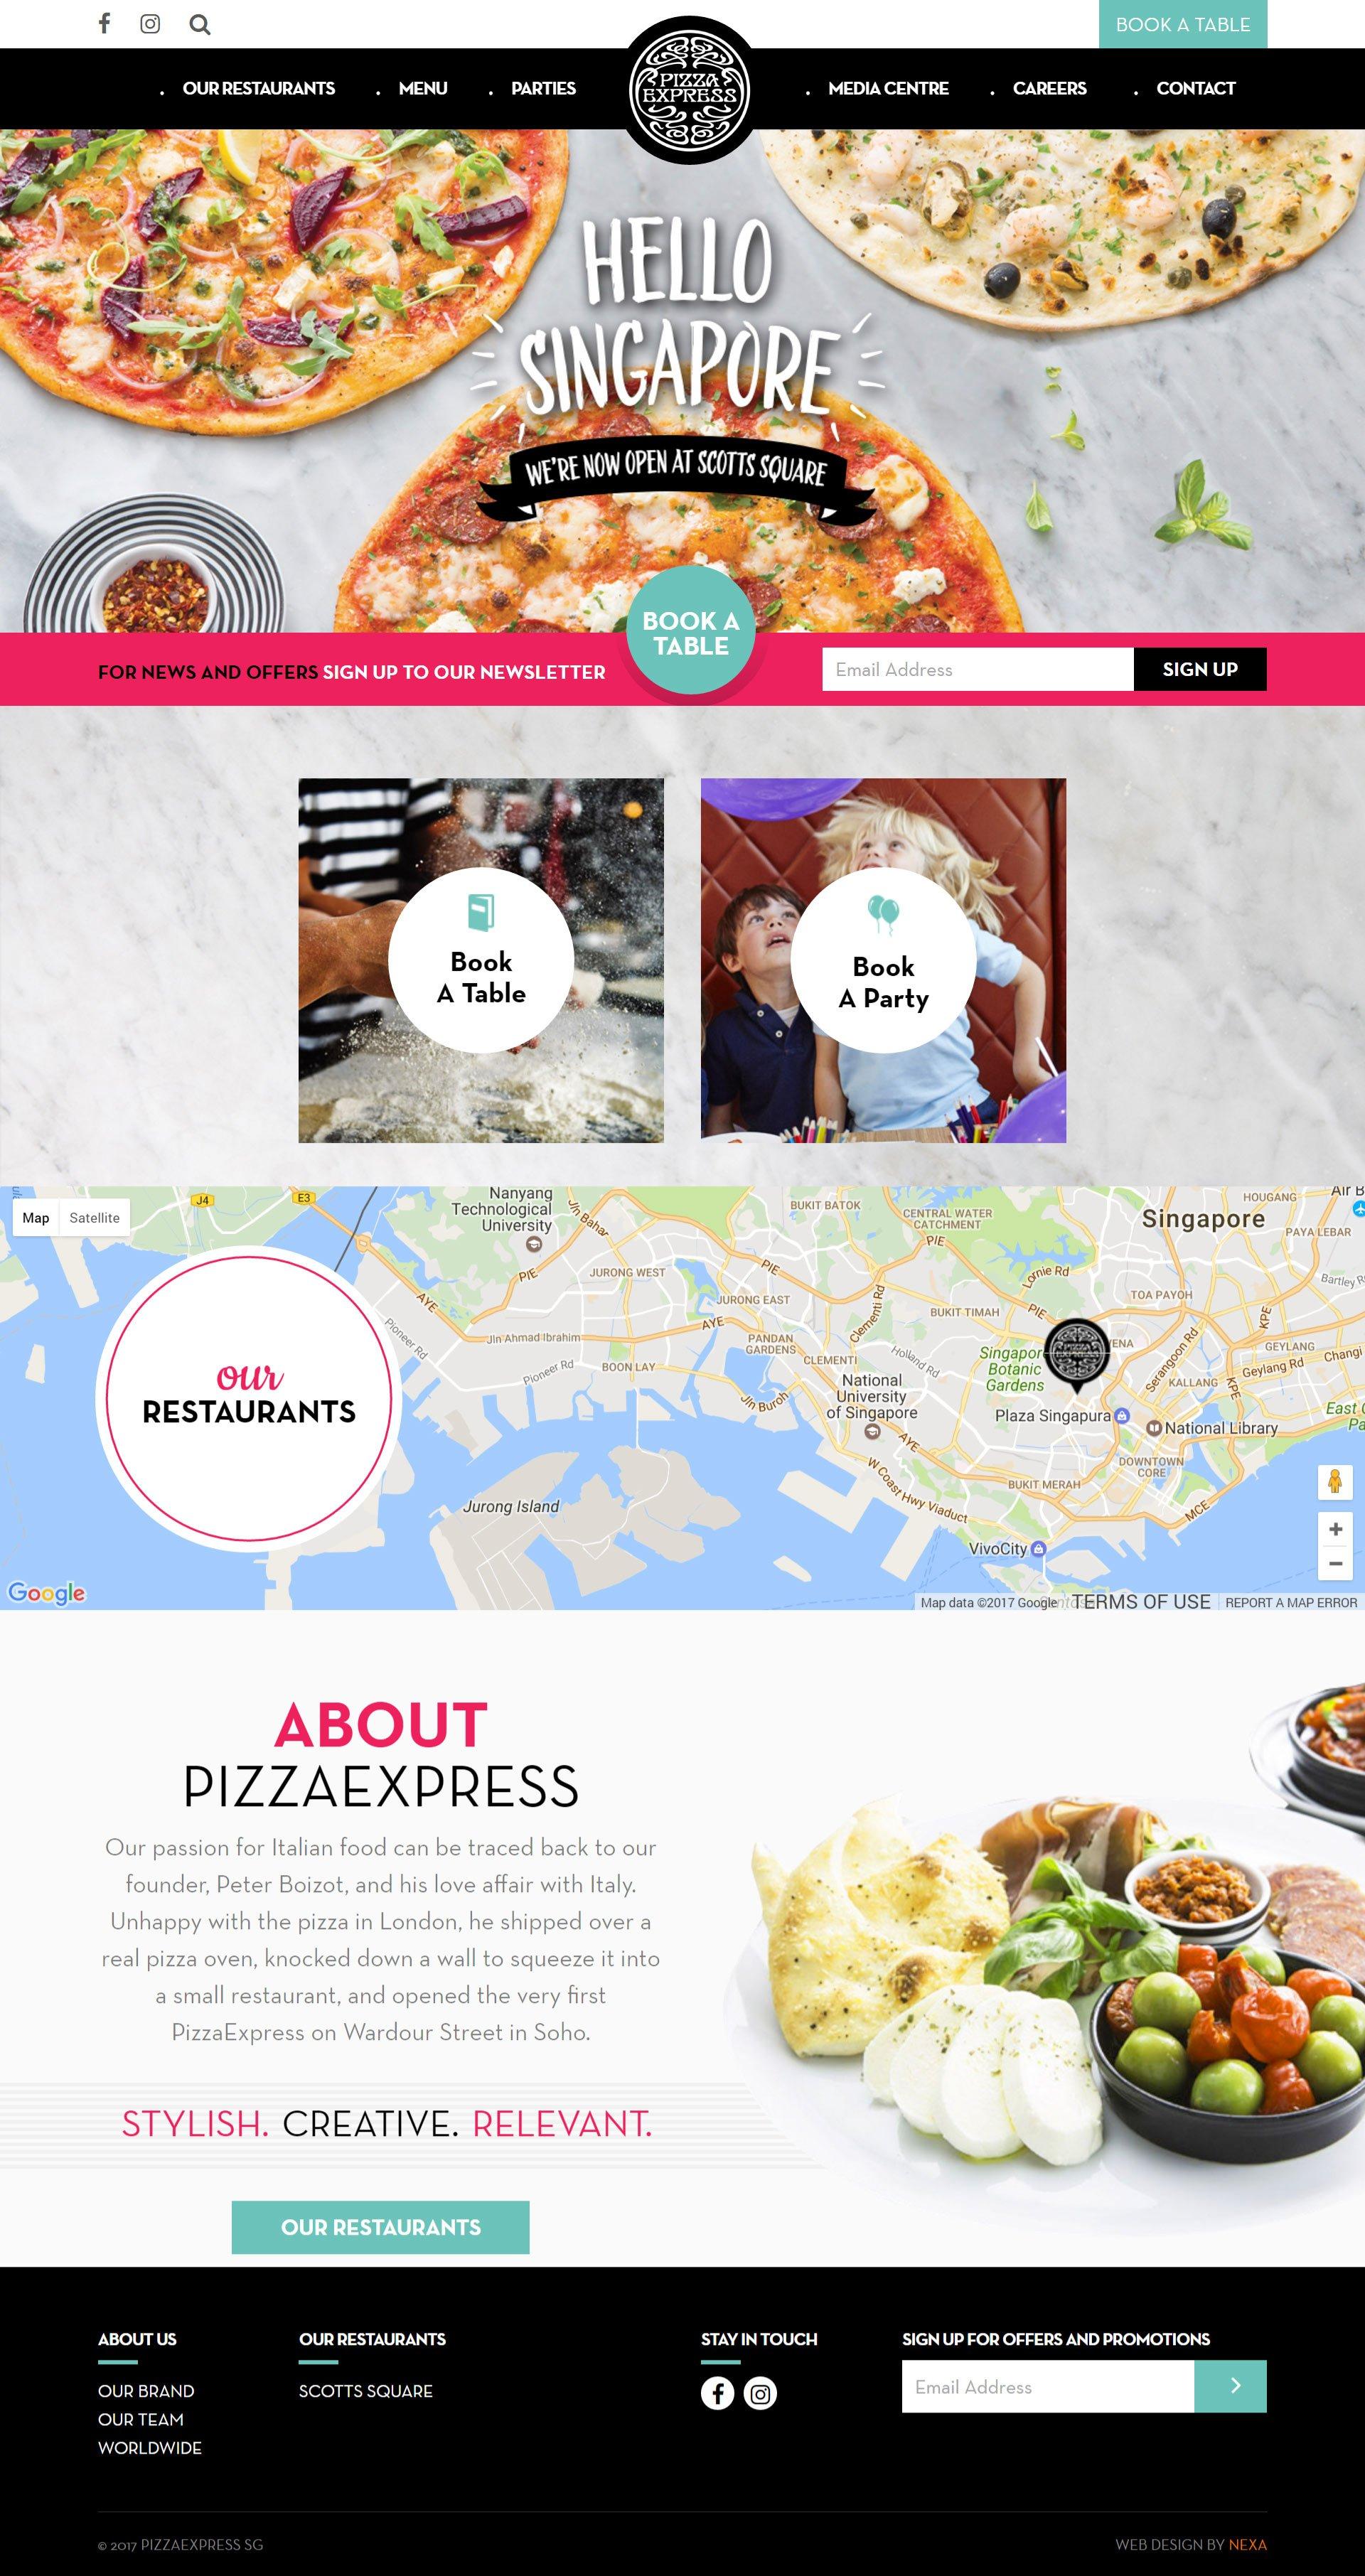 Pizza Express - Singapore